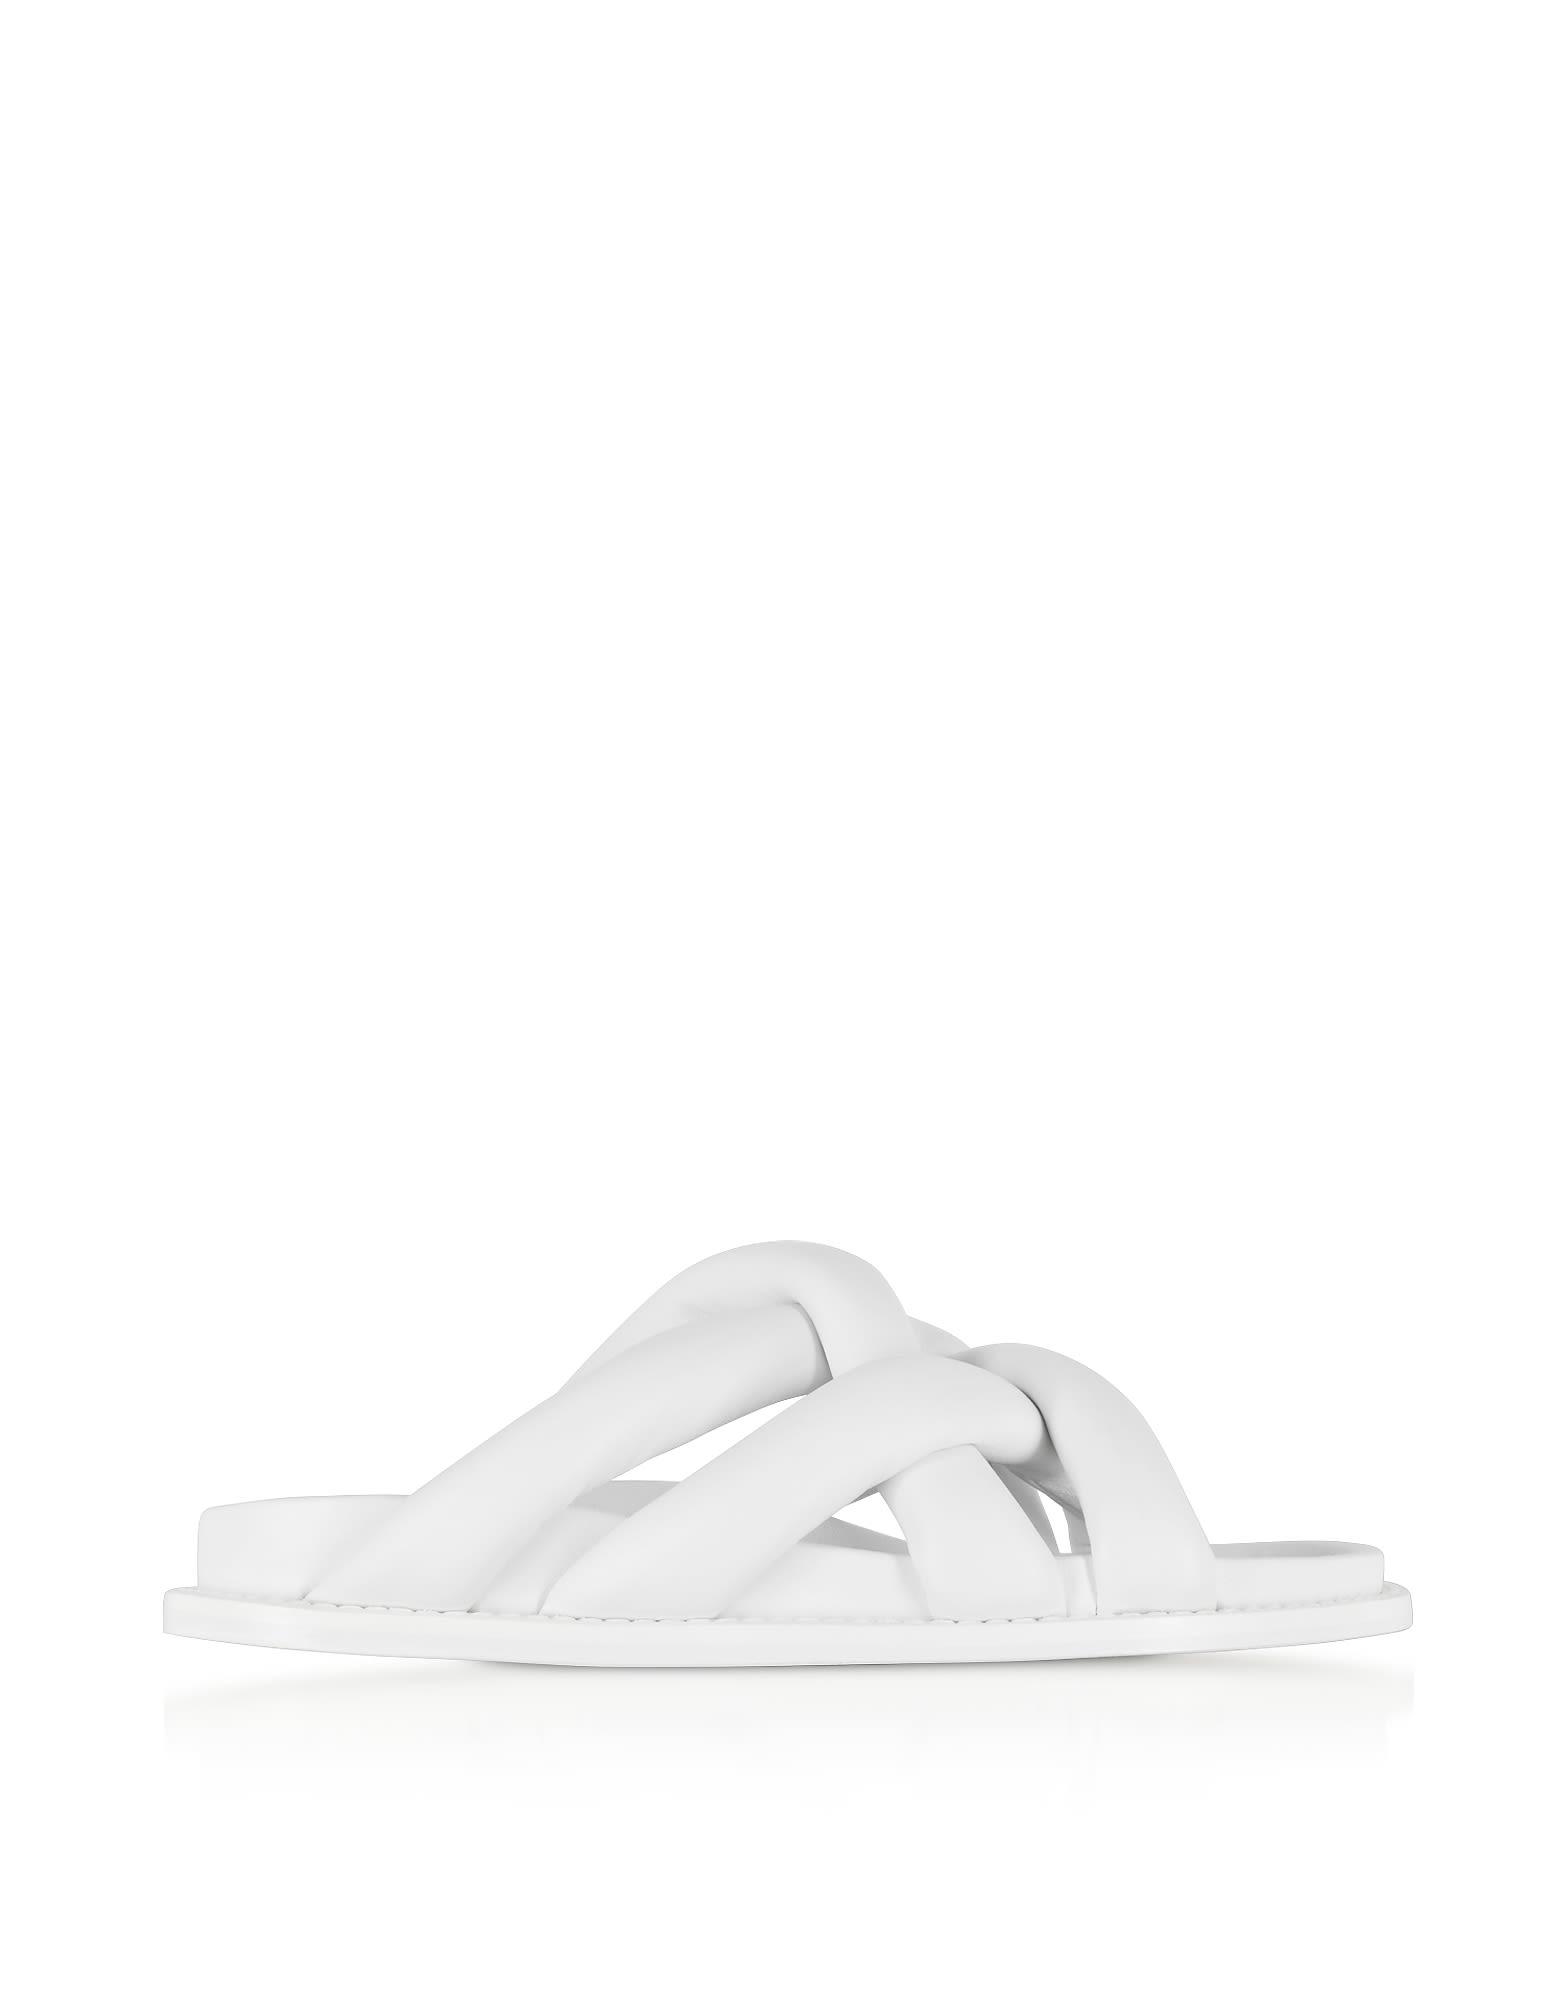 proenza schouler -  Optic White Suede Flat Sandals